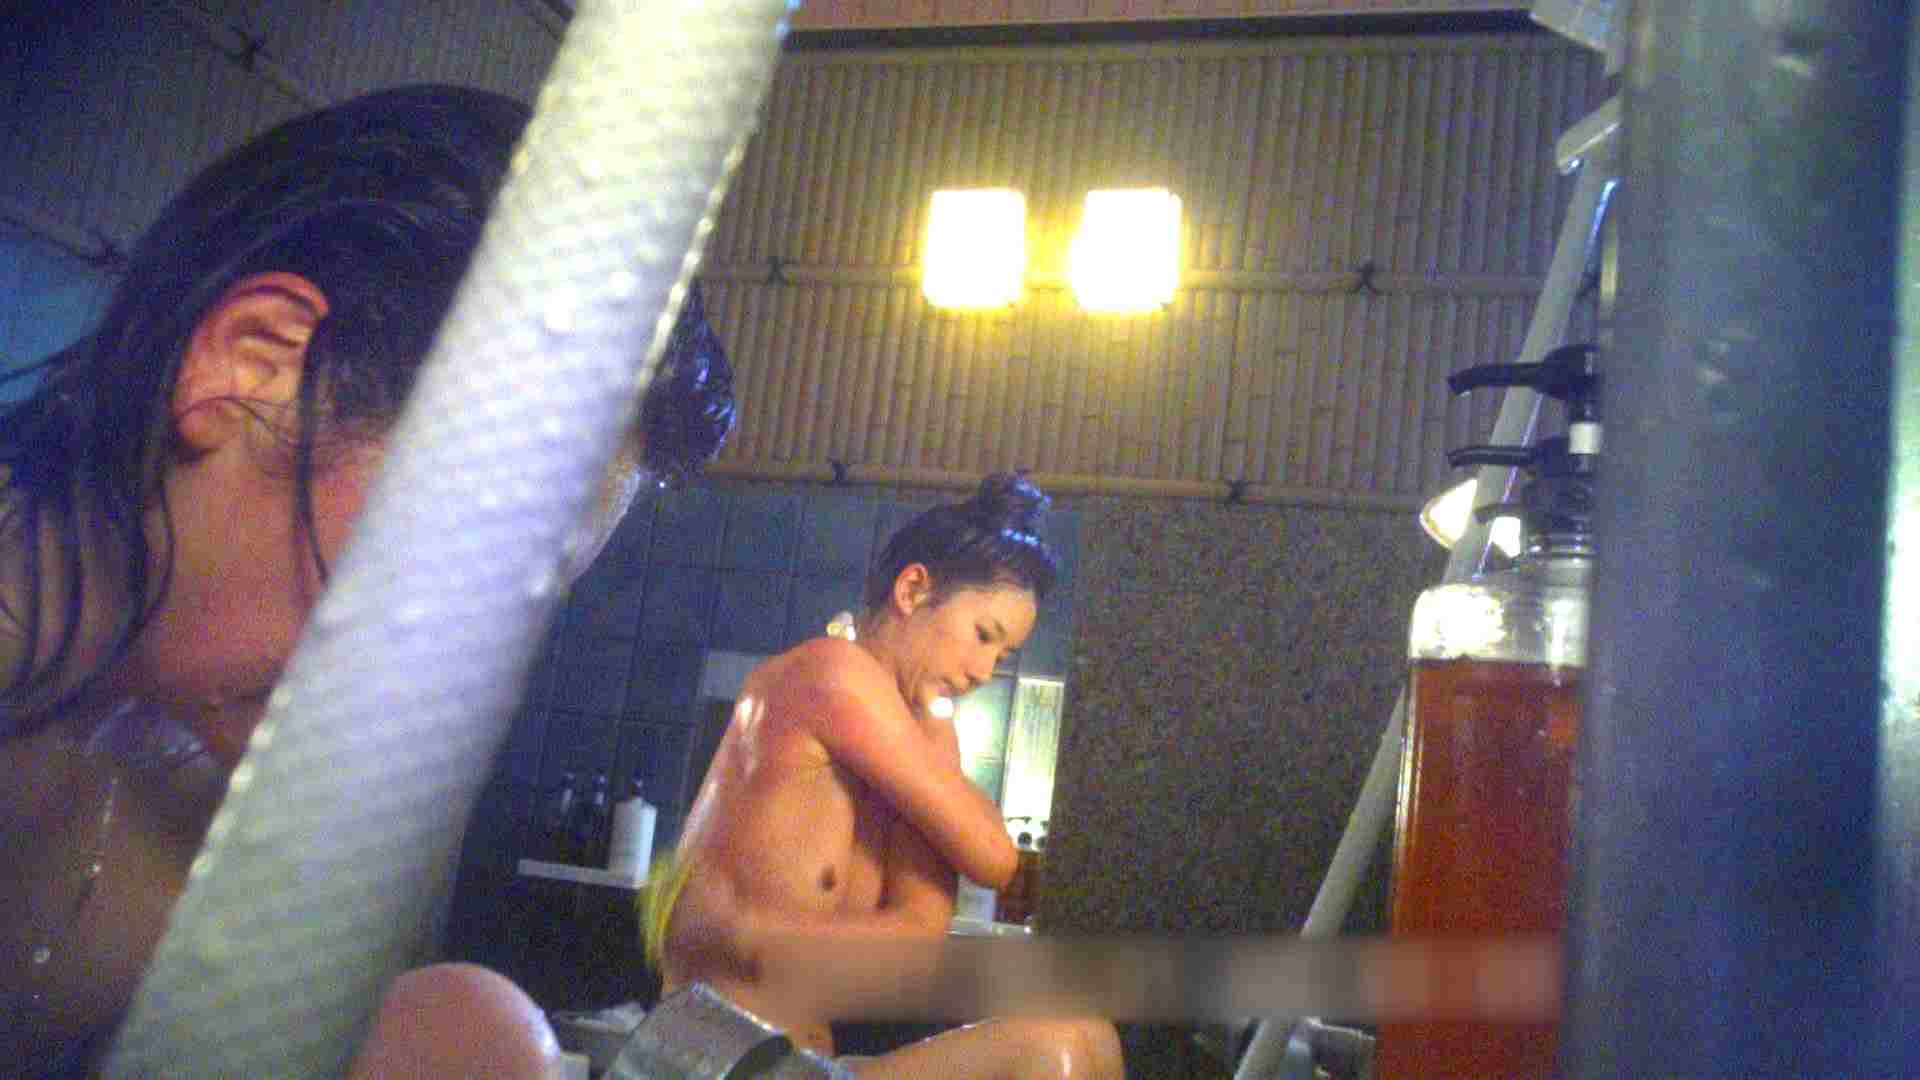 TG.15 【上等兵】高級旅館の爆乳女将で有名っぽい 潜入  86pic 75